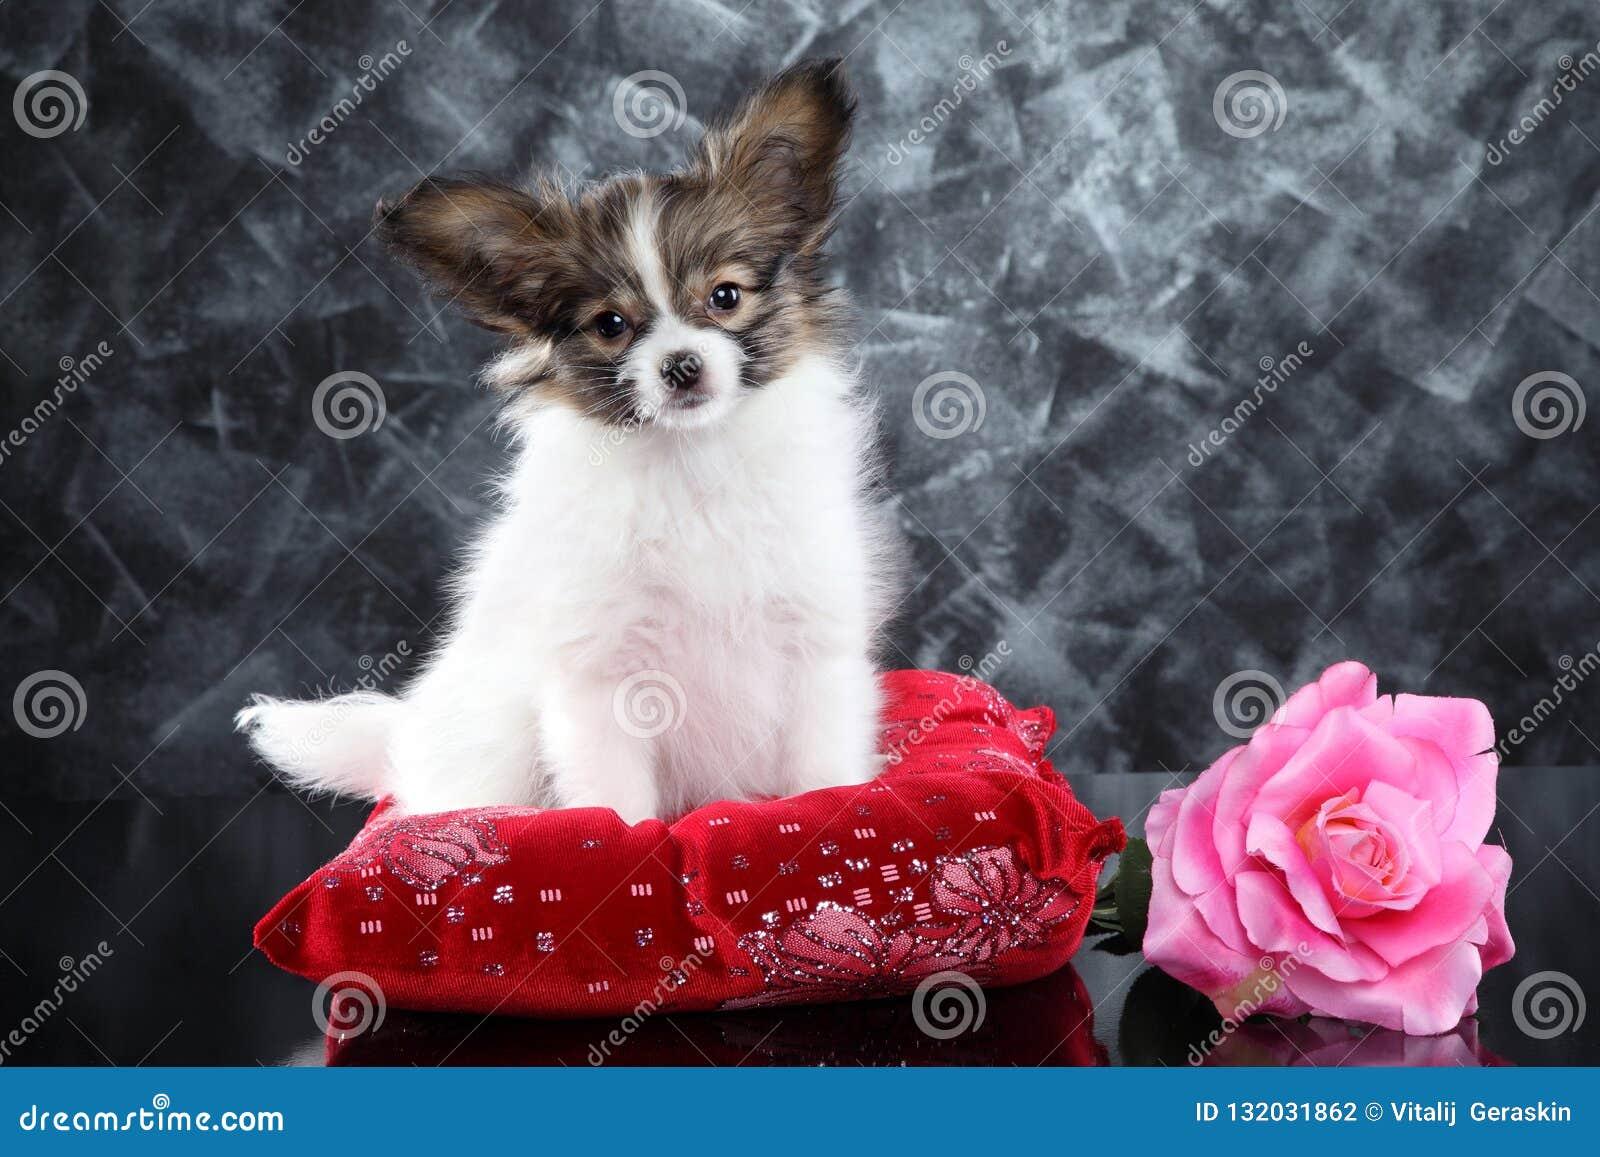 Continentaal Toy Spaniel-puppy op rood hoofdkussen